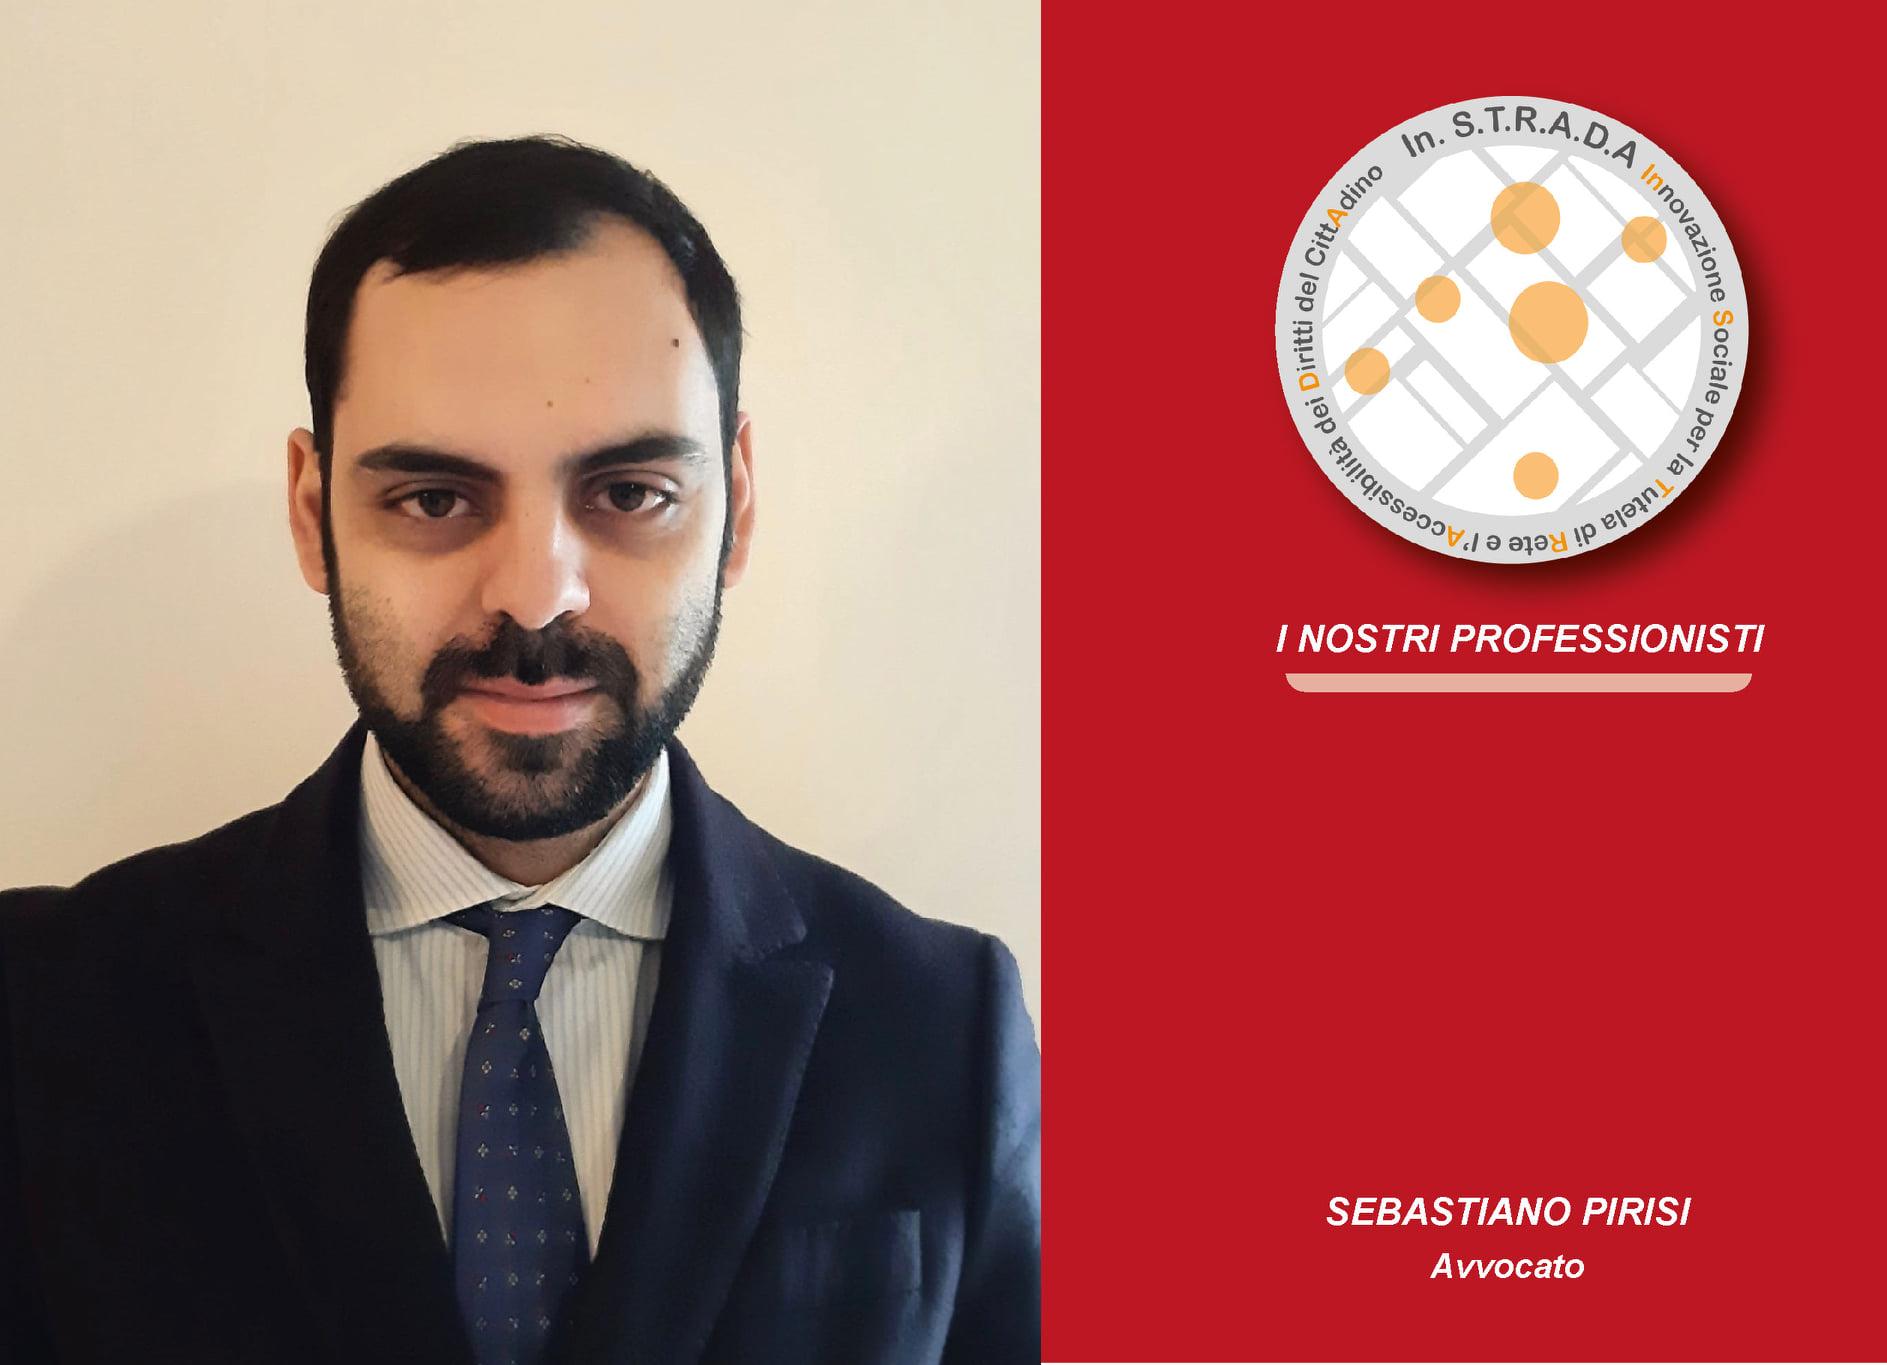 Associazione In.S.T.R.A.D.A, Sebastiano Pirisi, avvocato